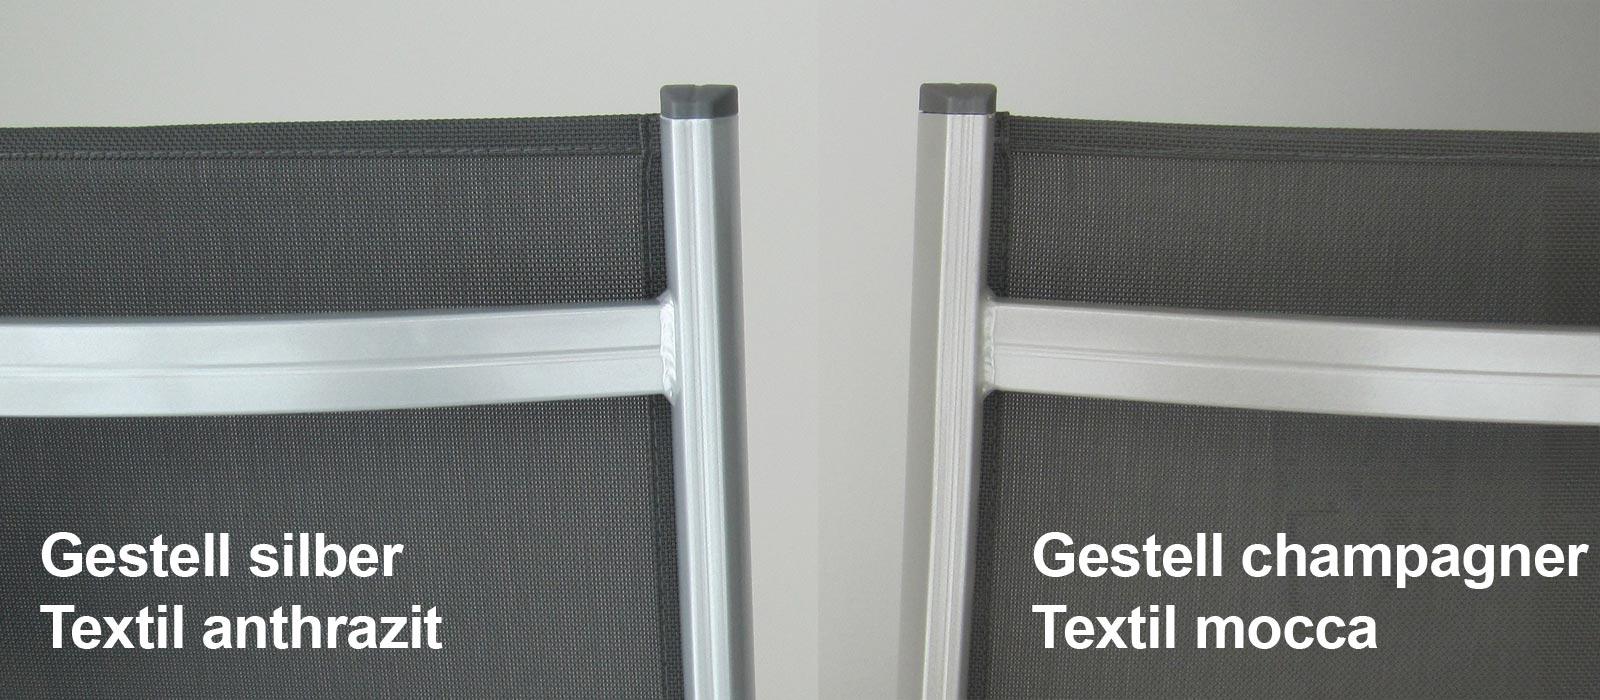 kettler gartenliege basic plus 0301214 000 stapelbar silber anthr alu bei. Black Bedroom Furniture Sets. Home Design Ideas